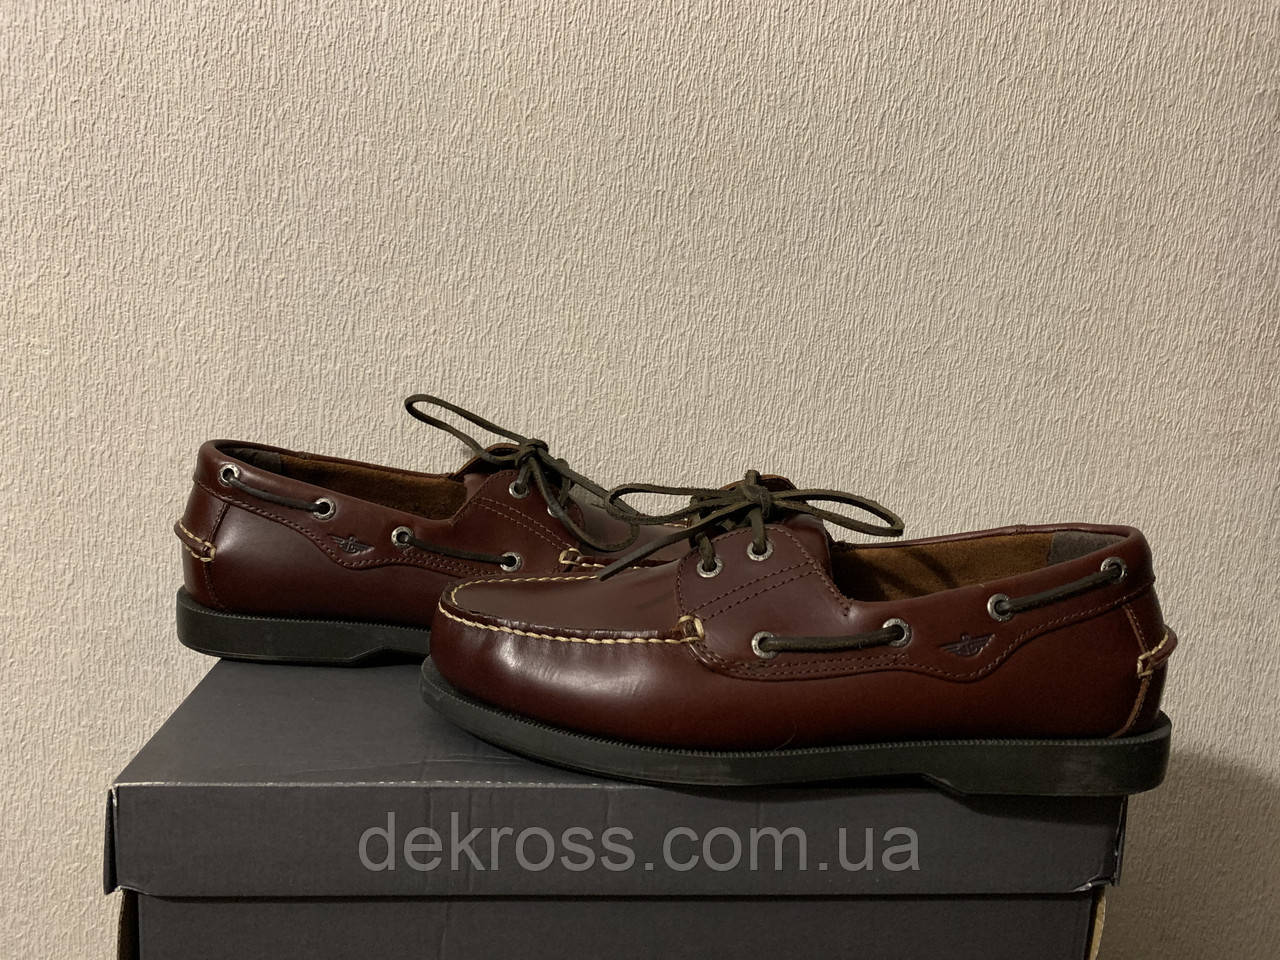 Топсайдеры \ лофери Dockers Castaway Boat Shoes Raisin (42) Оригінал 90-1449